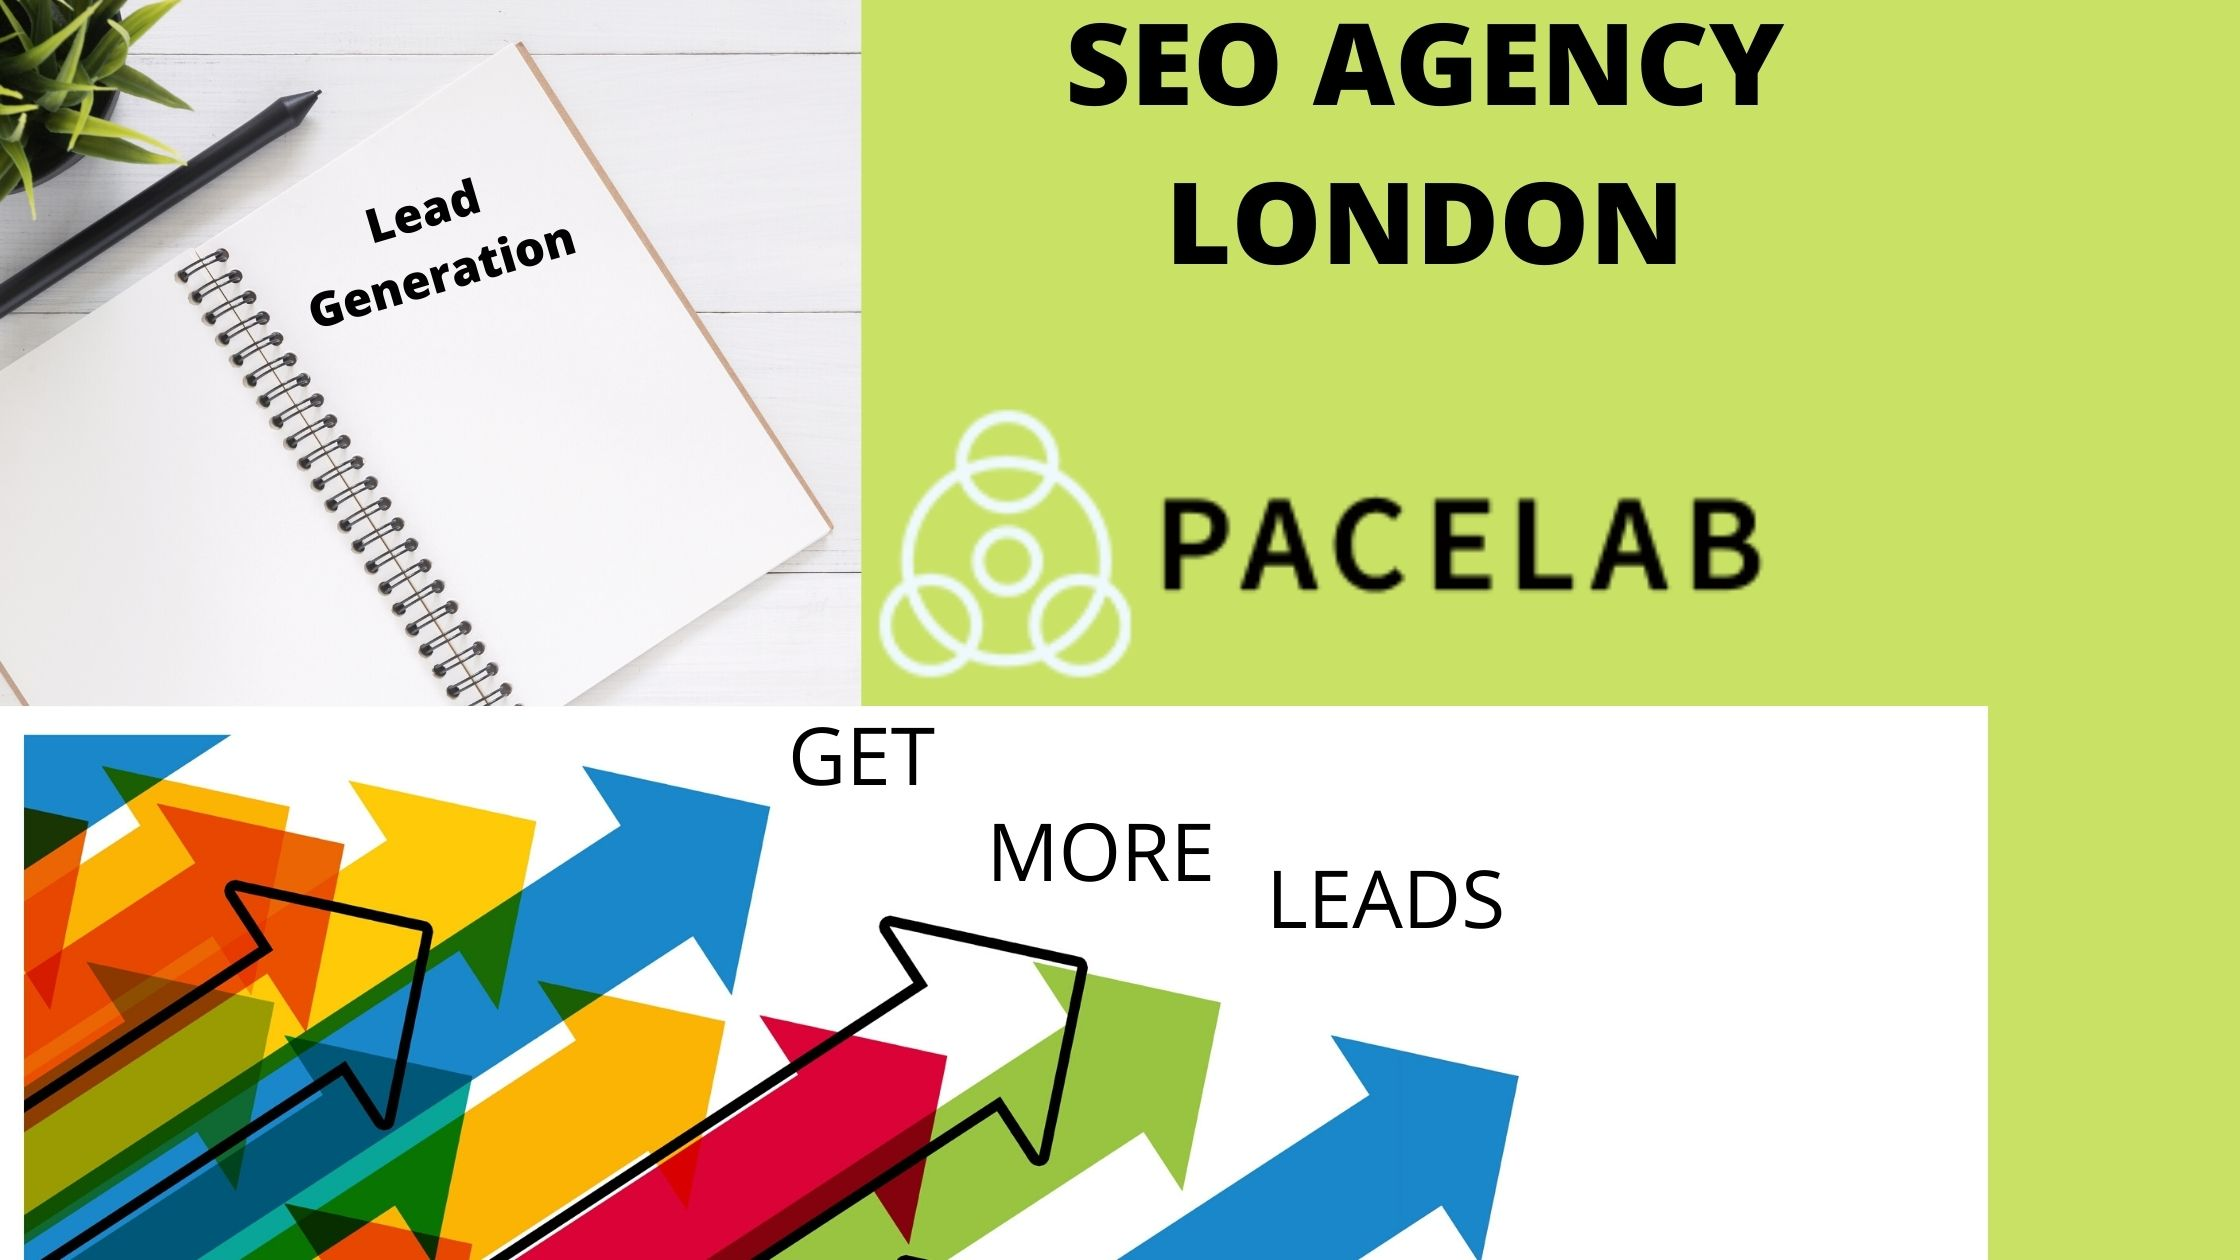 Lead Generation- Pacelab SEO Agency London